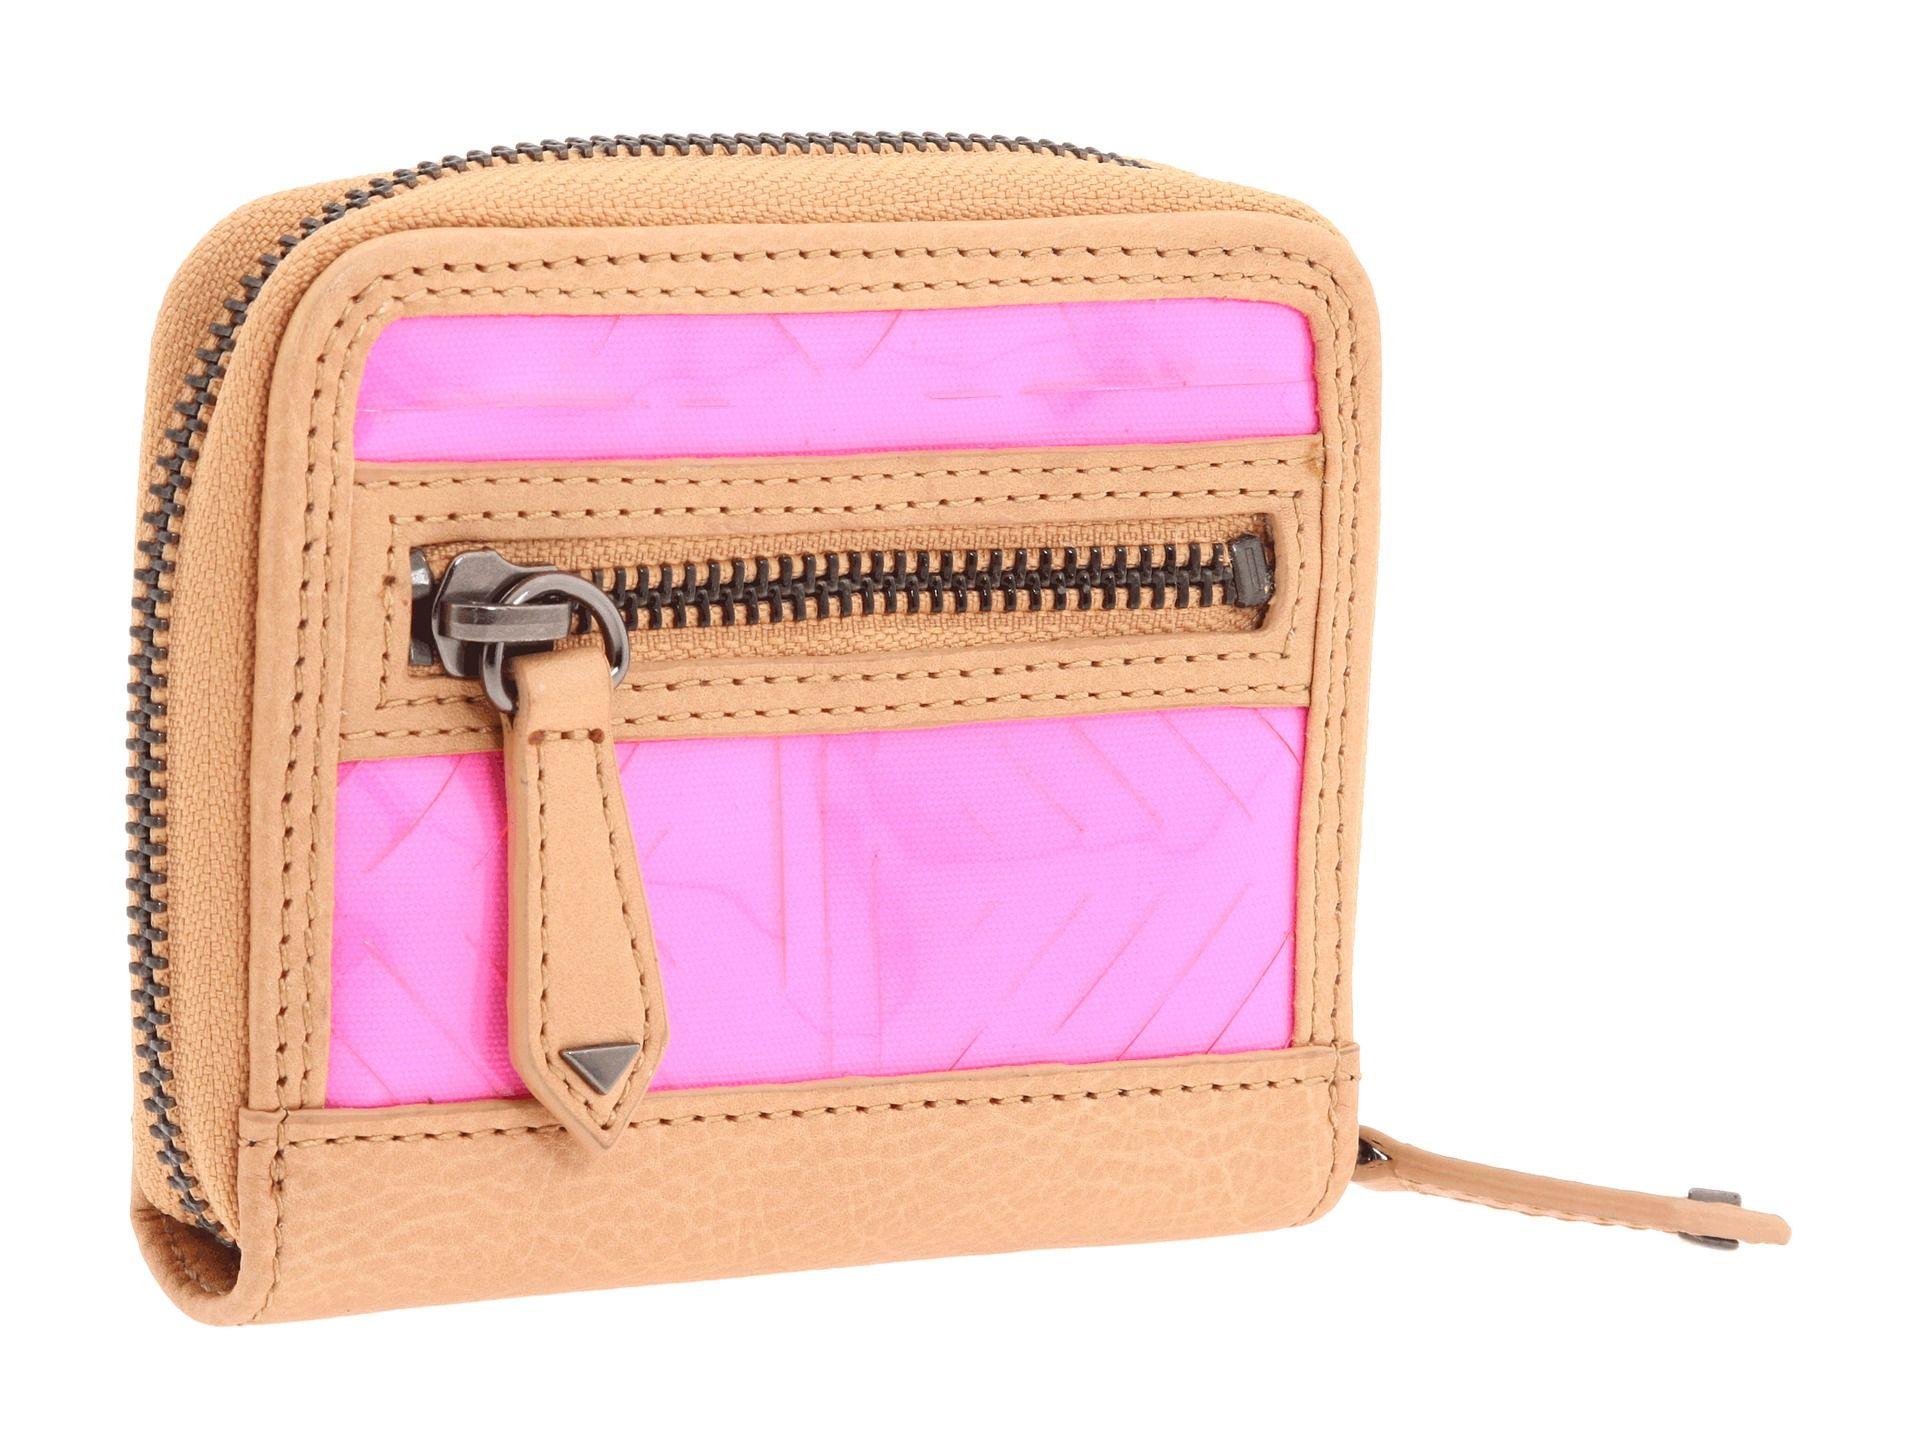 L.A.M.B. wallet